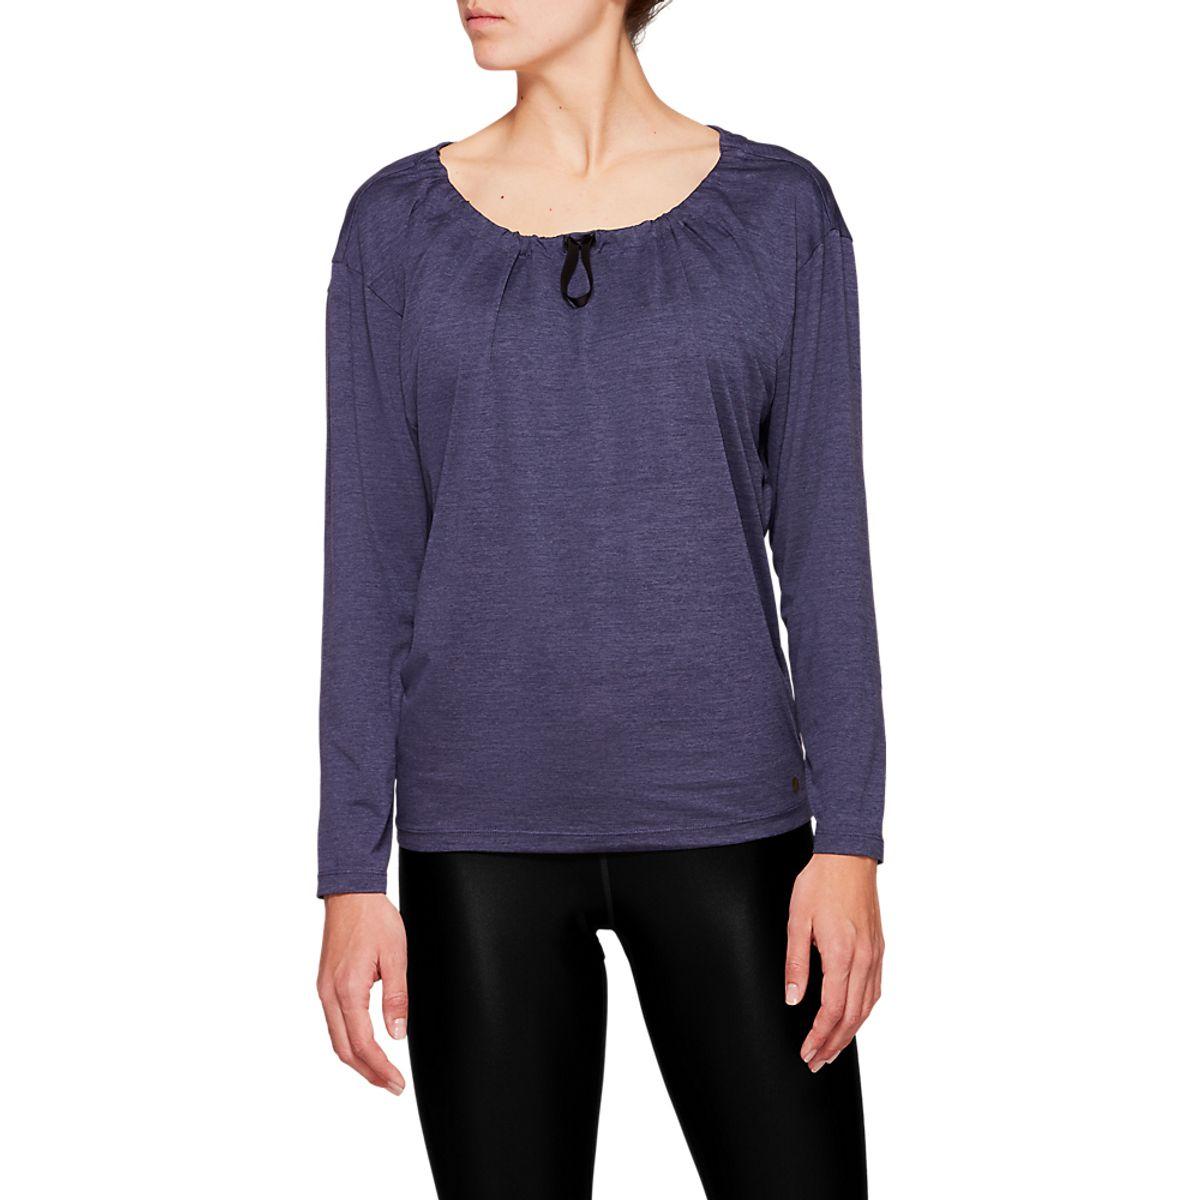 Camiseta-Asics-Short-Sleeve---Feminino---Cinza